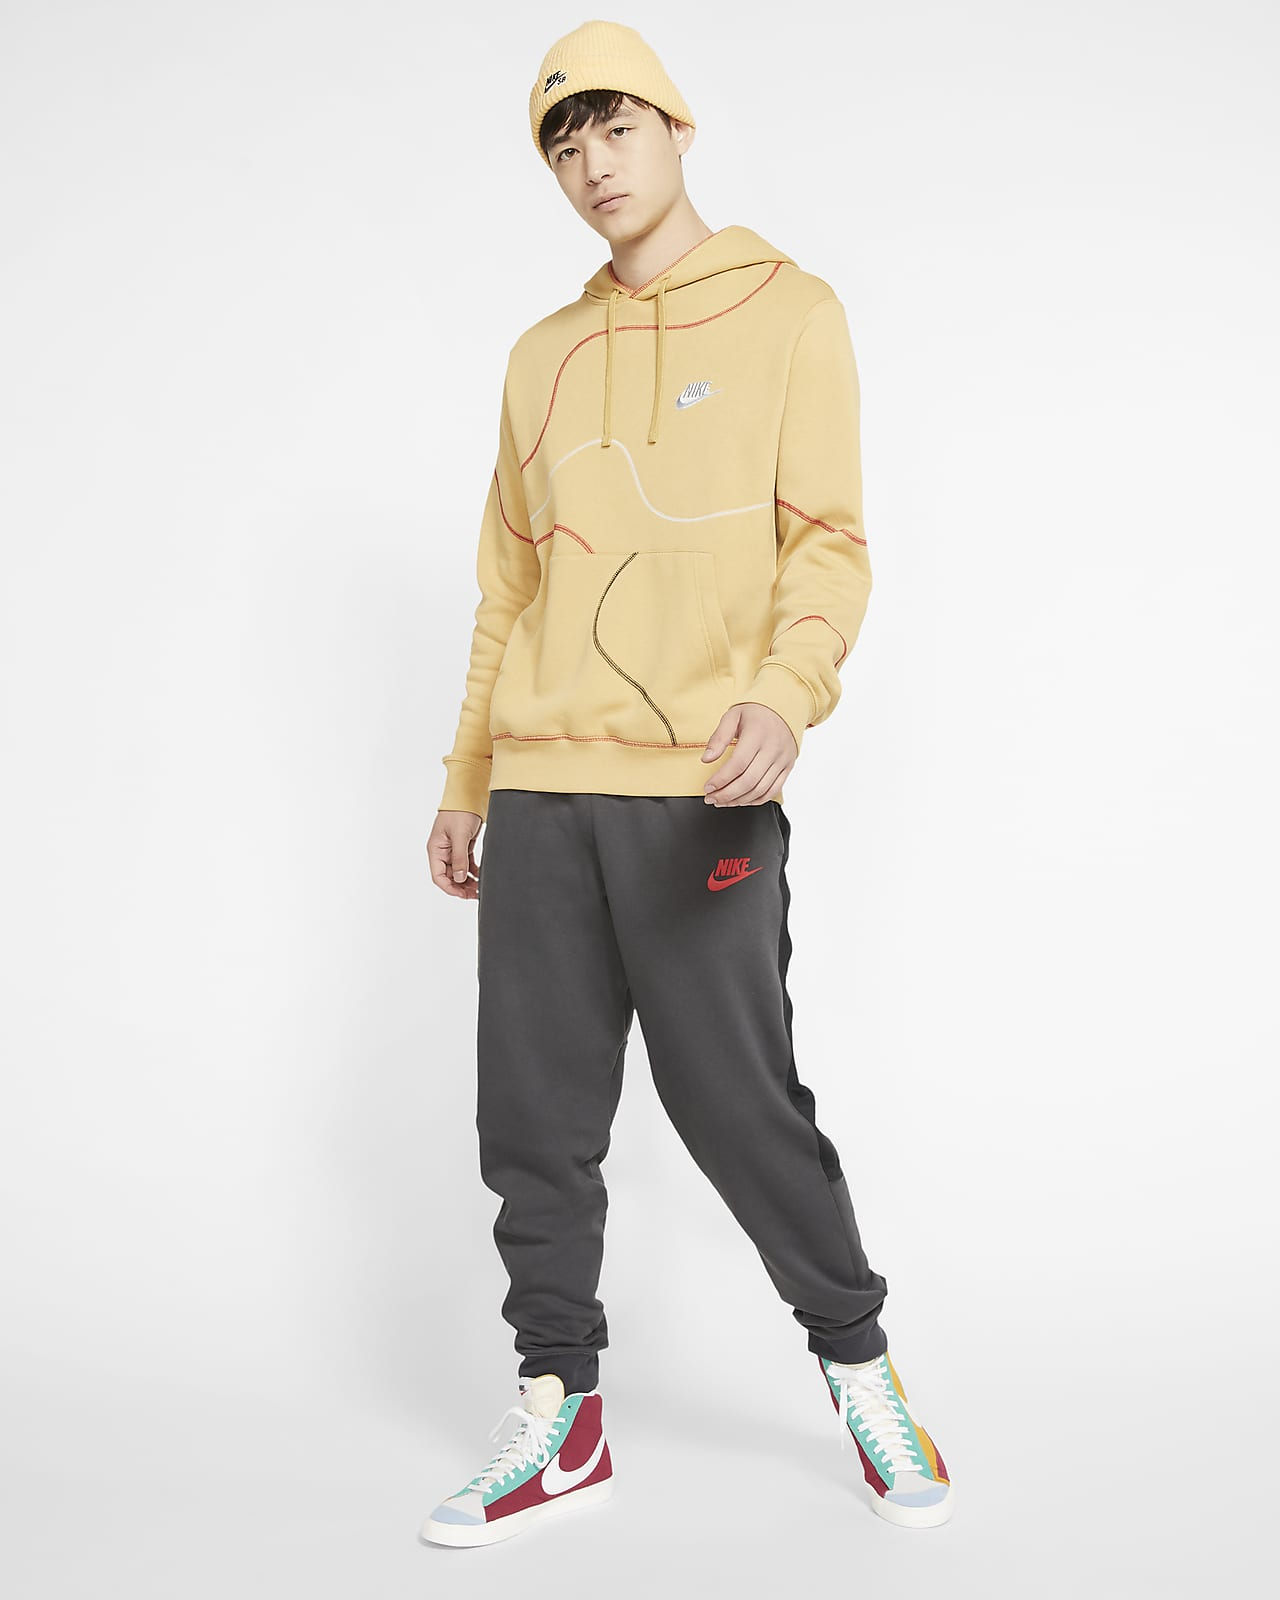 Nike Sportswear Herren-Jogger mit Grafik